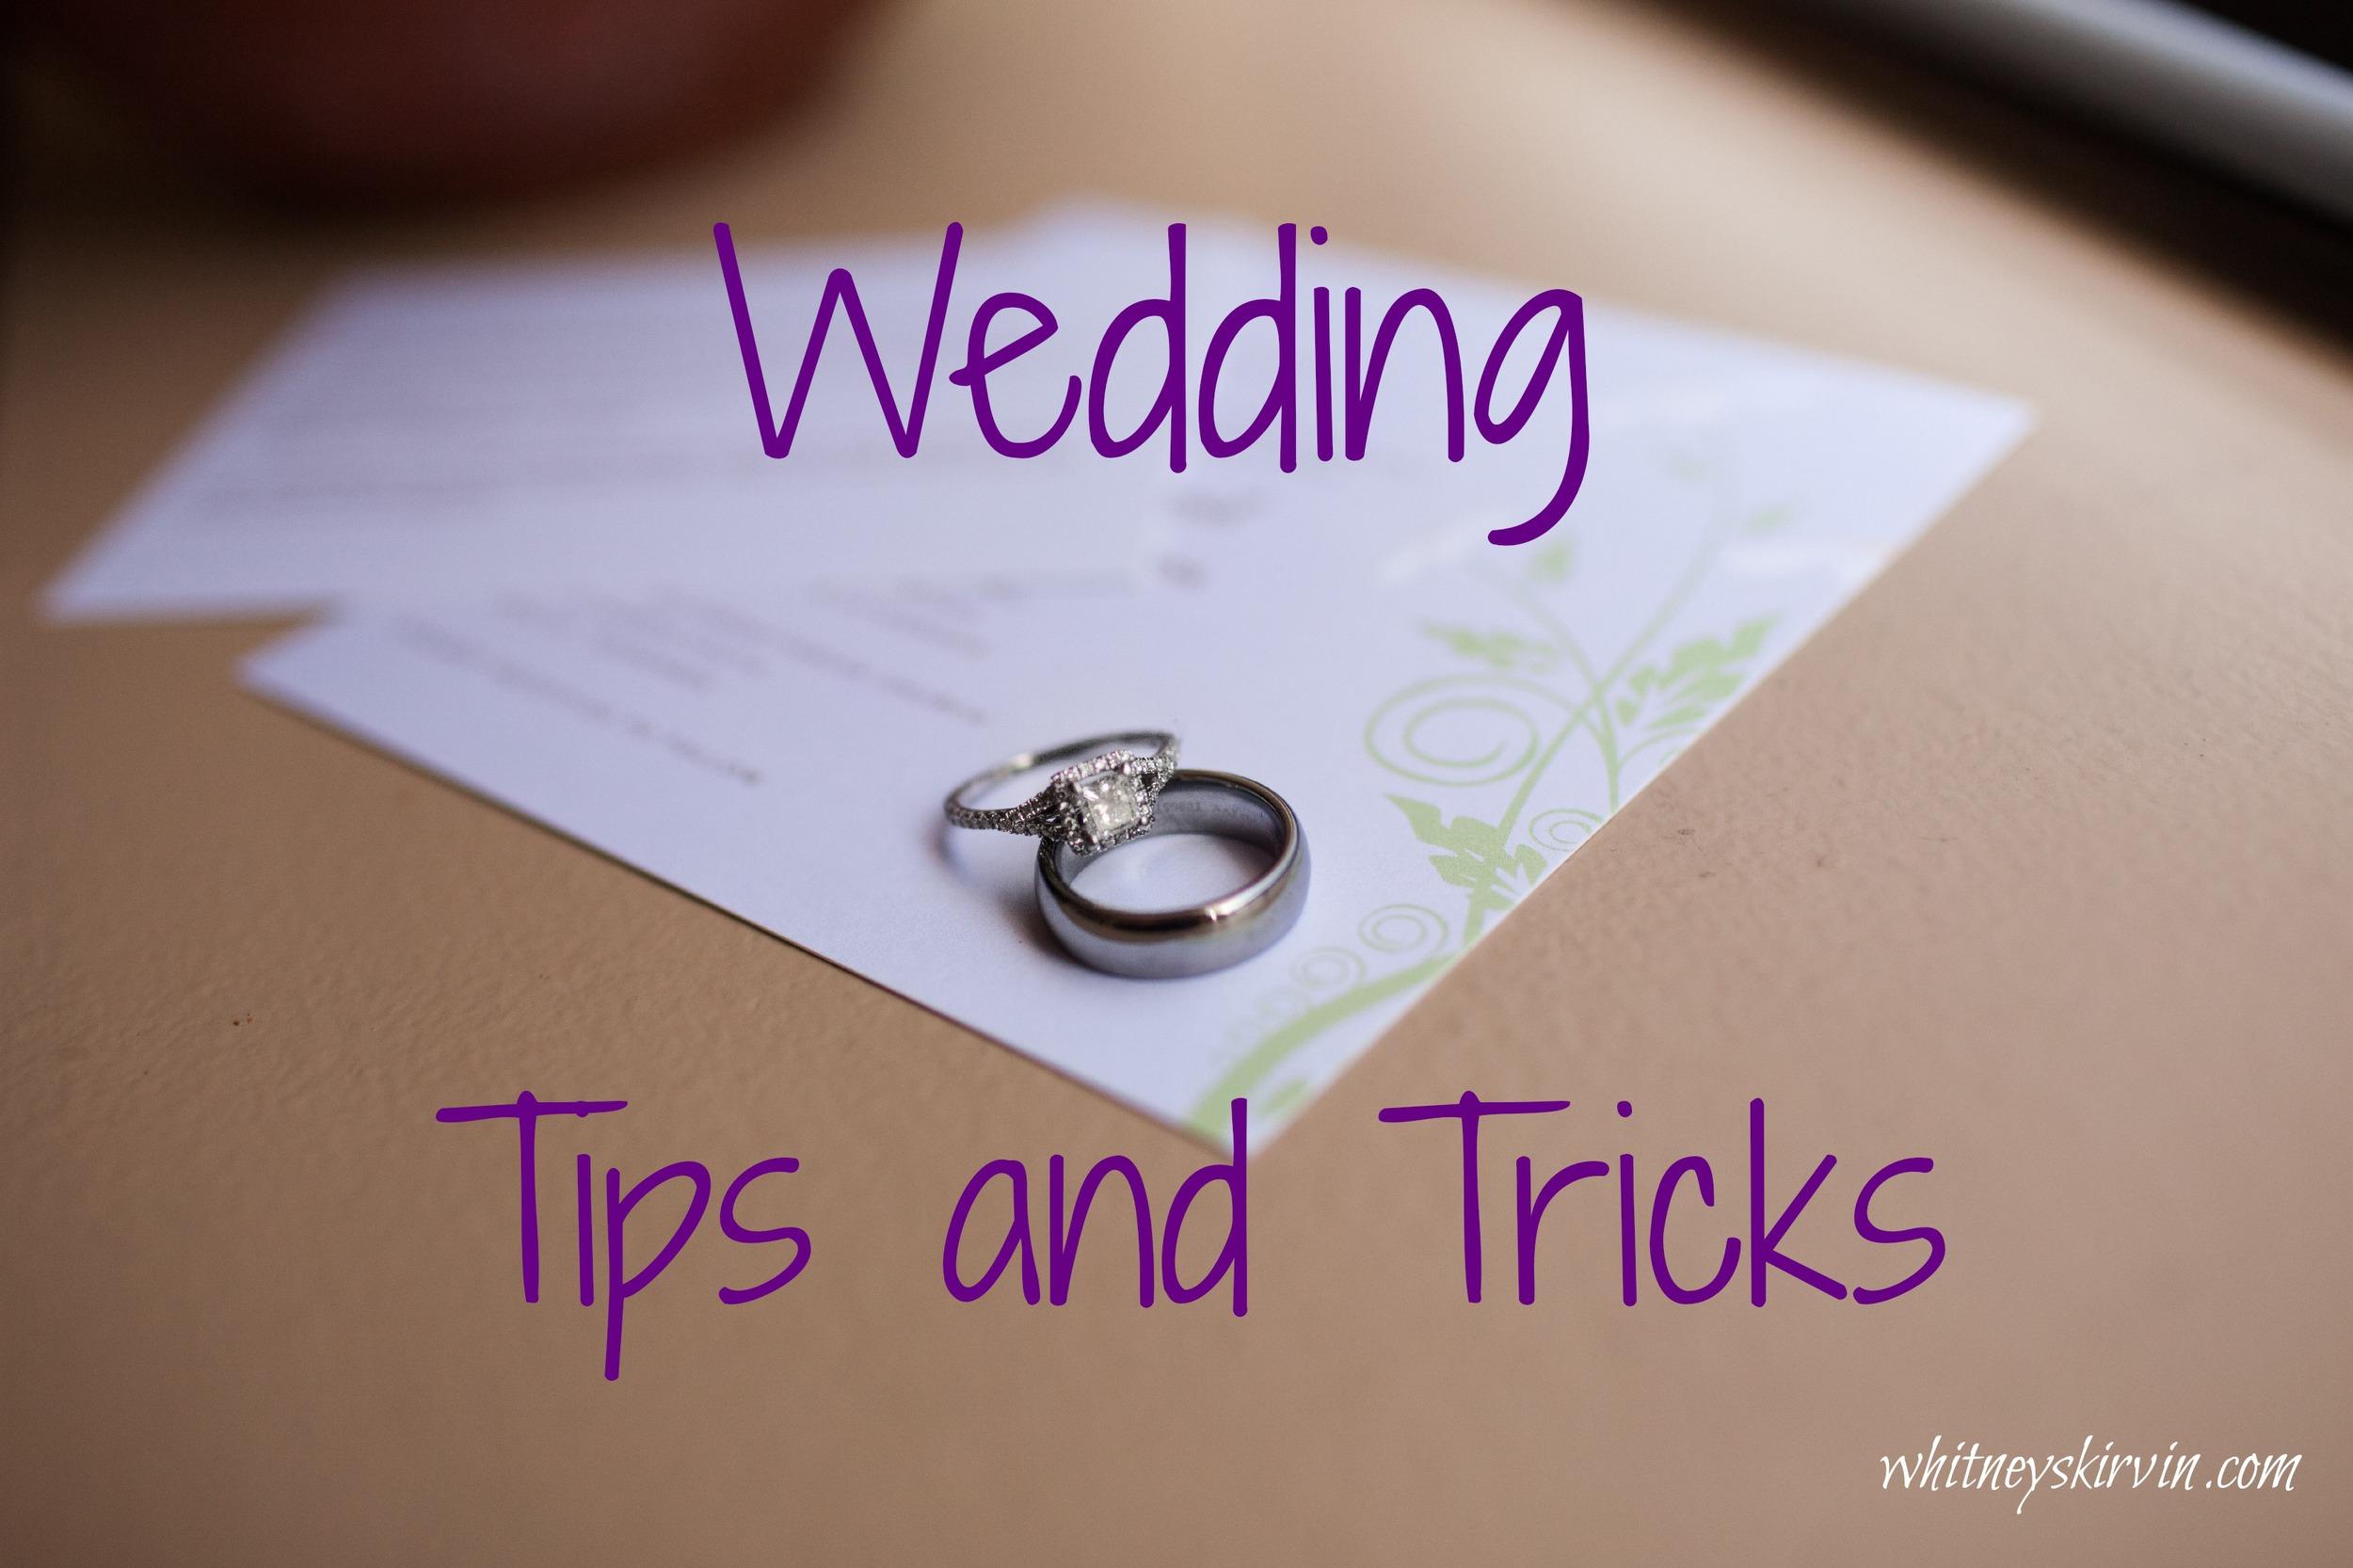 wedding-tips-and-tricks.jpg